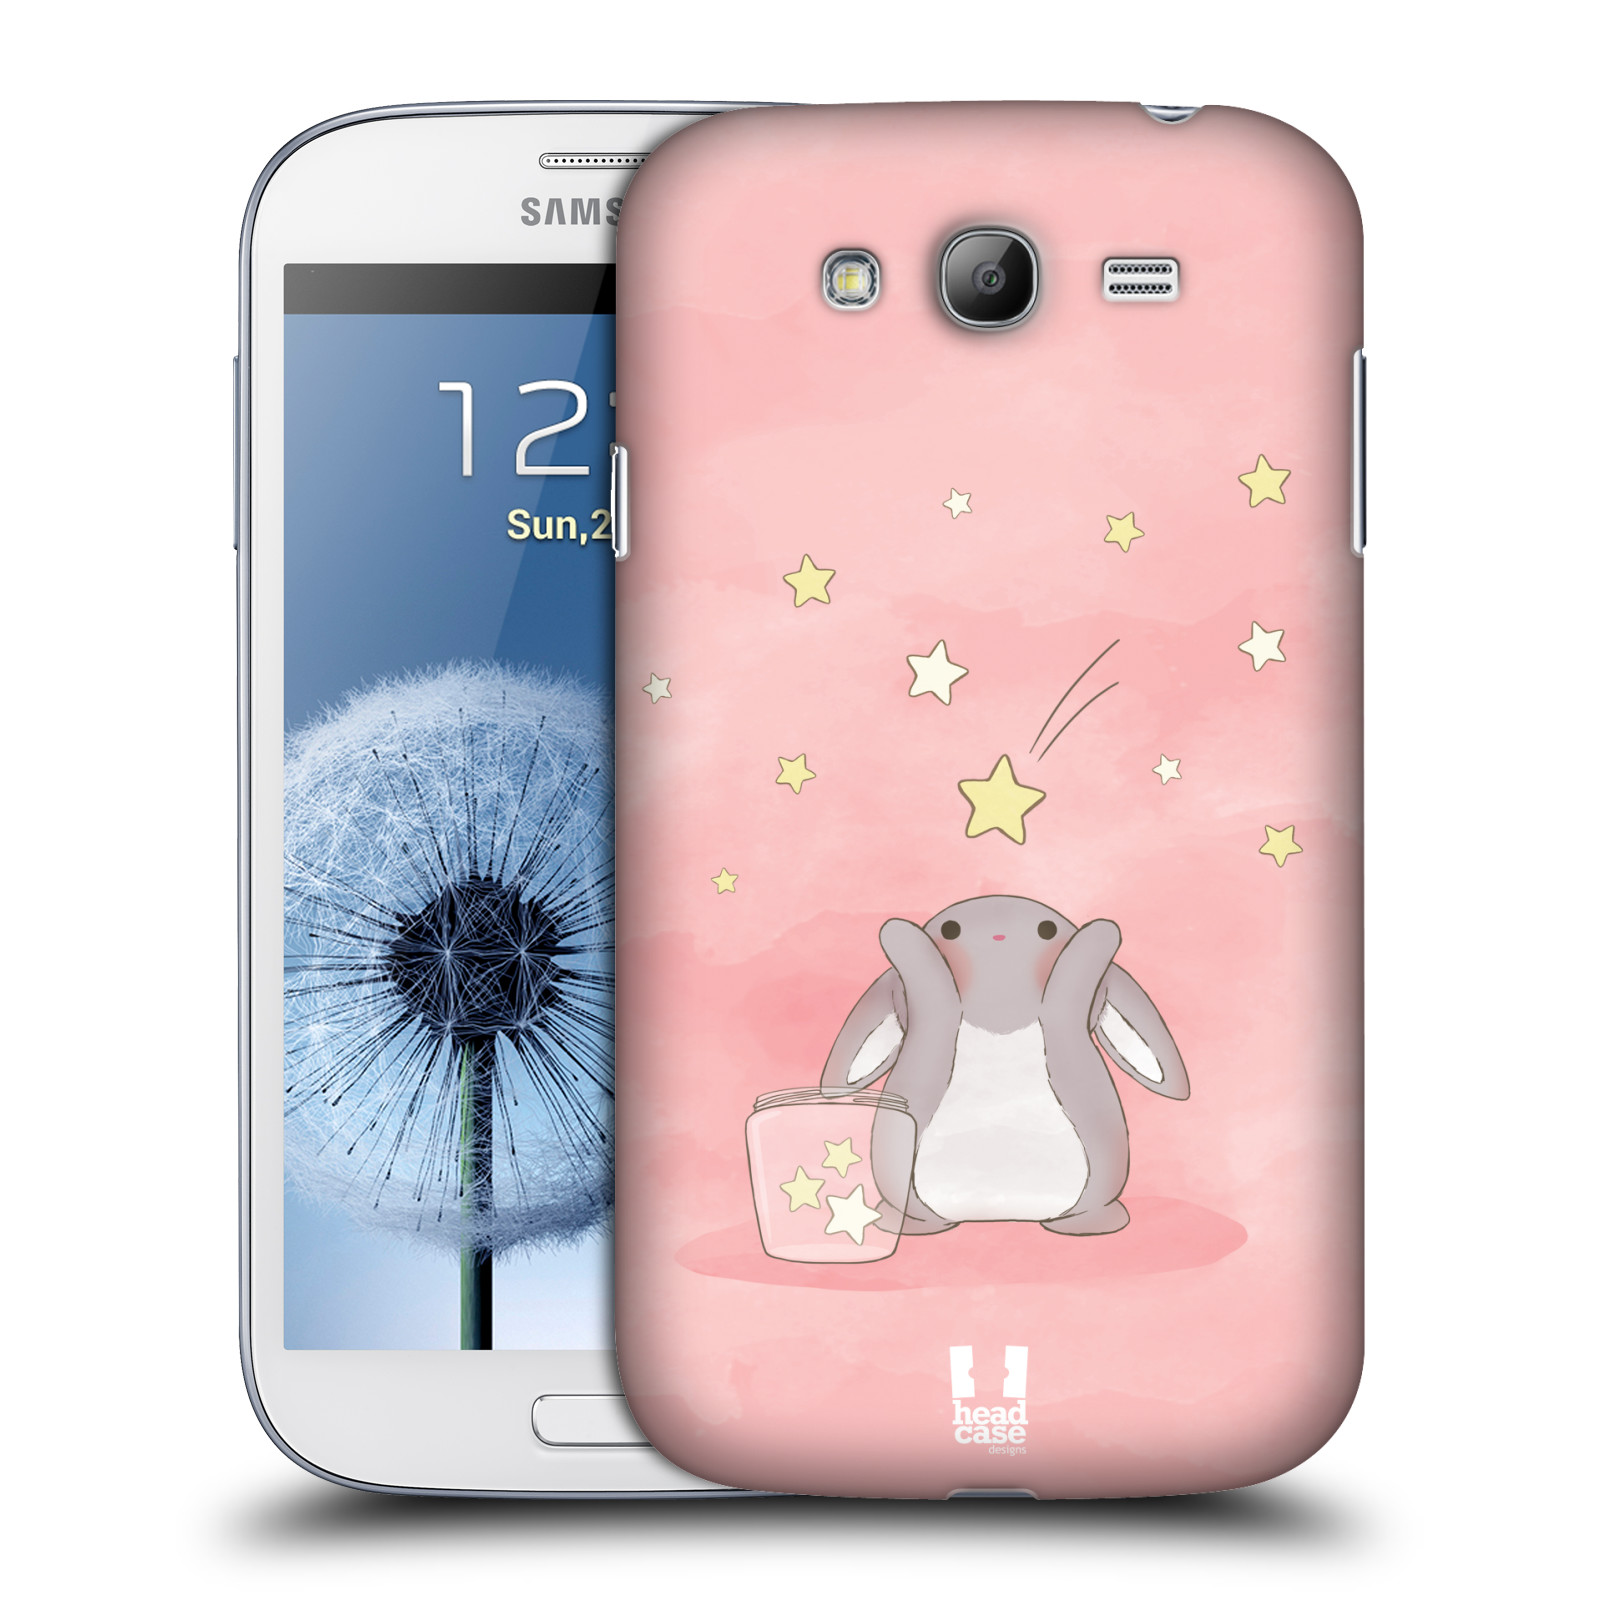 HEAD CASE plastový obal na mobil SAMSUNG GALAXY Grand i9080 vzor králíček a hvězdy růžová